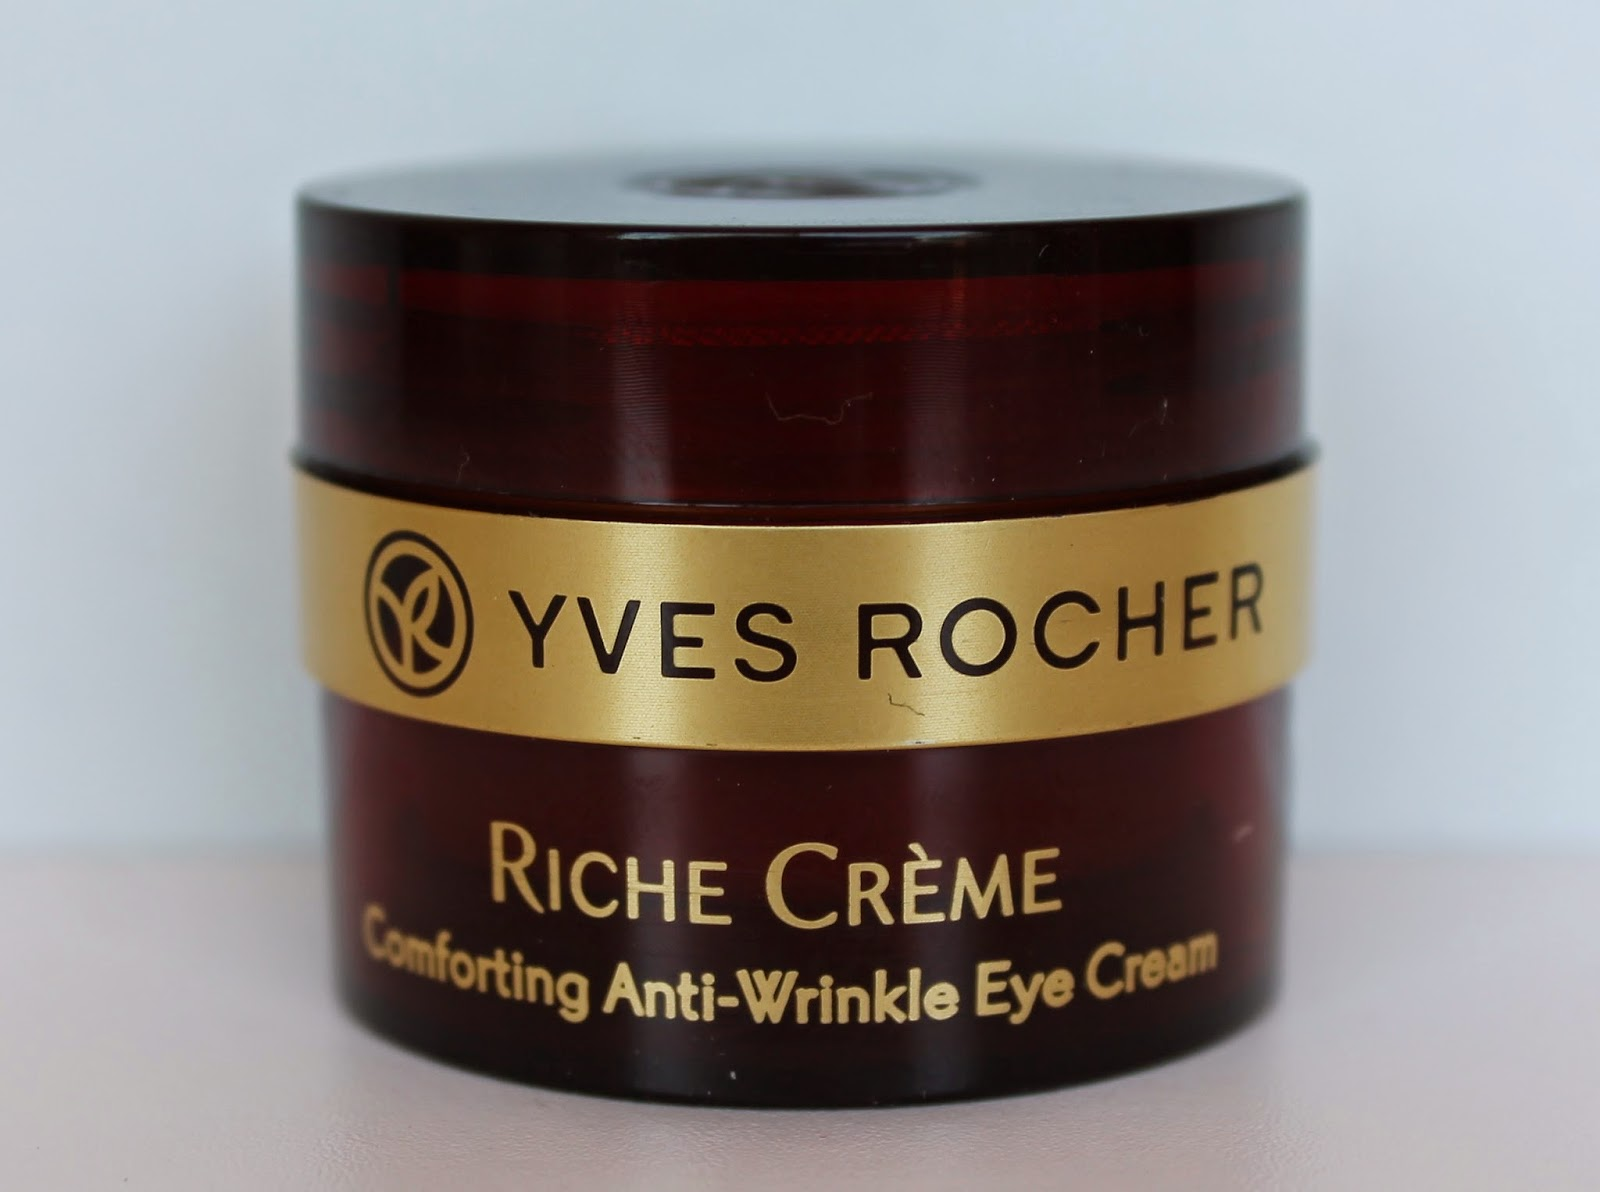 Yves Rocher Riche Crème